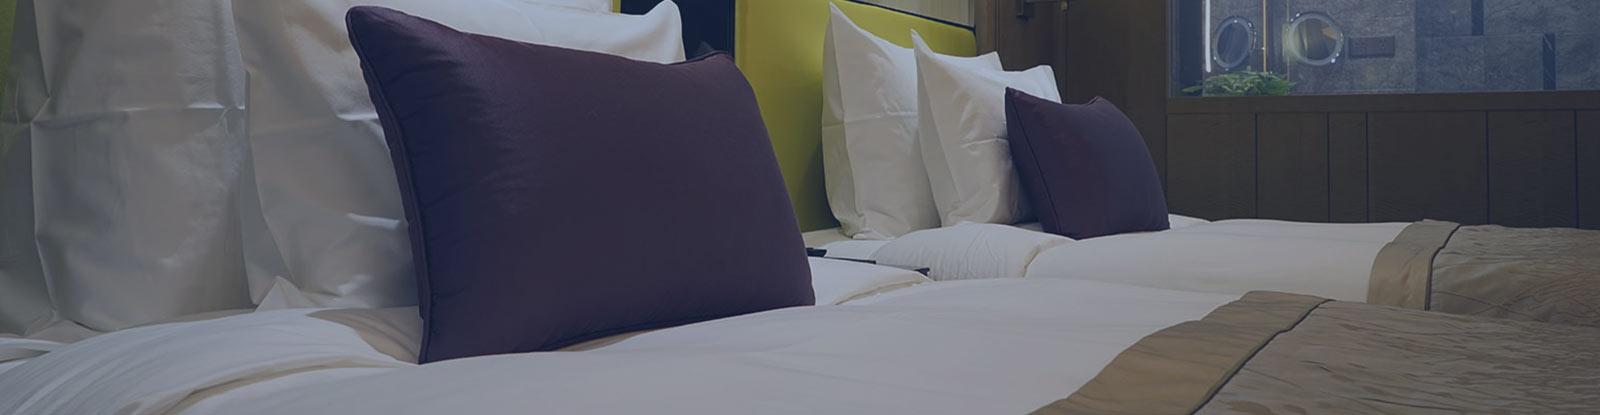 hotel-pest-control